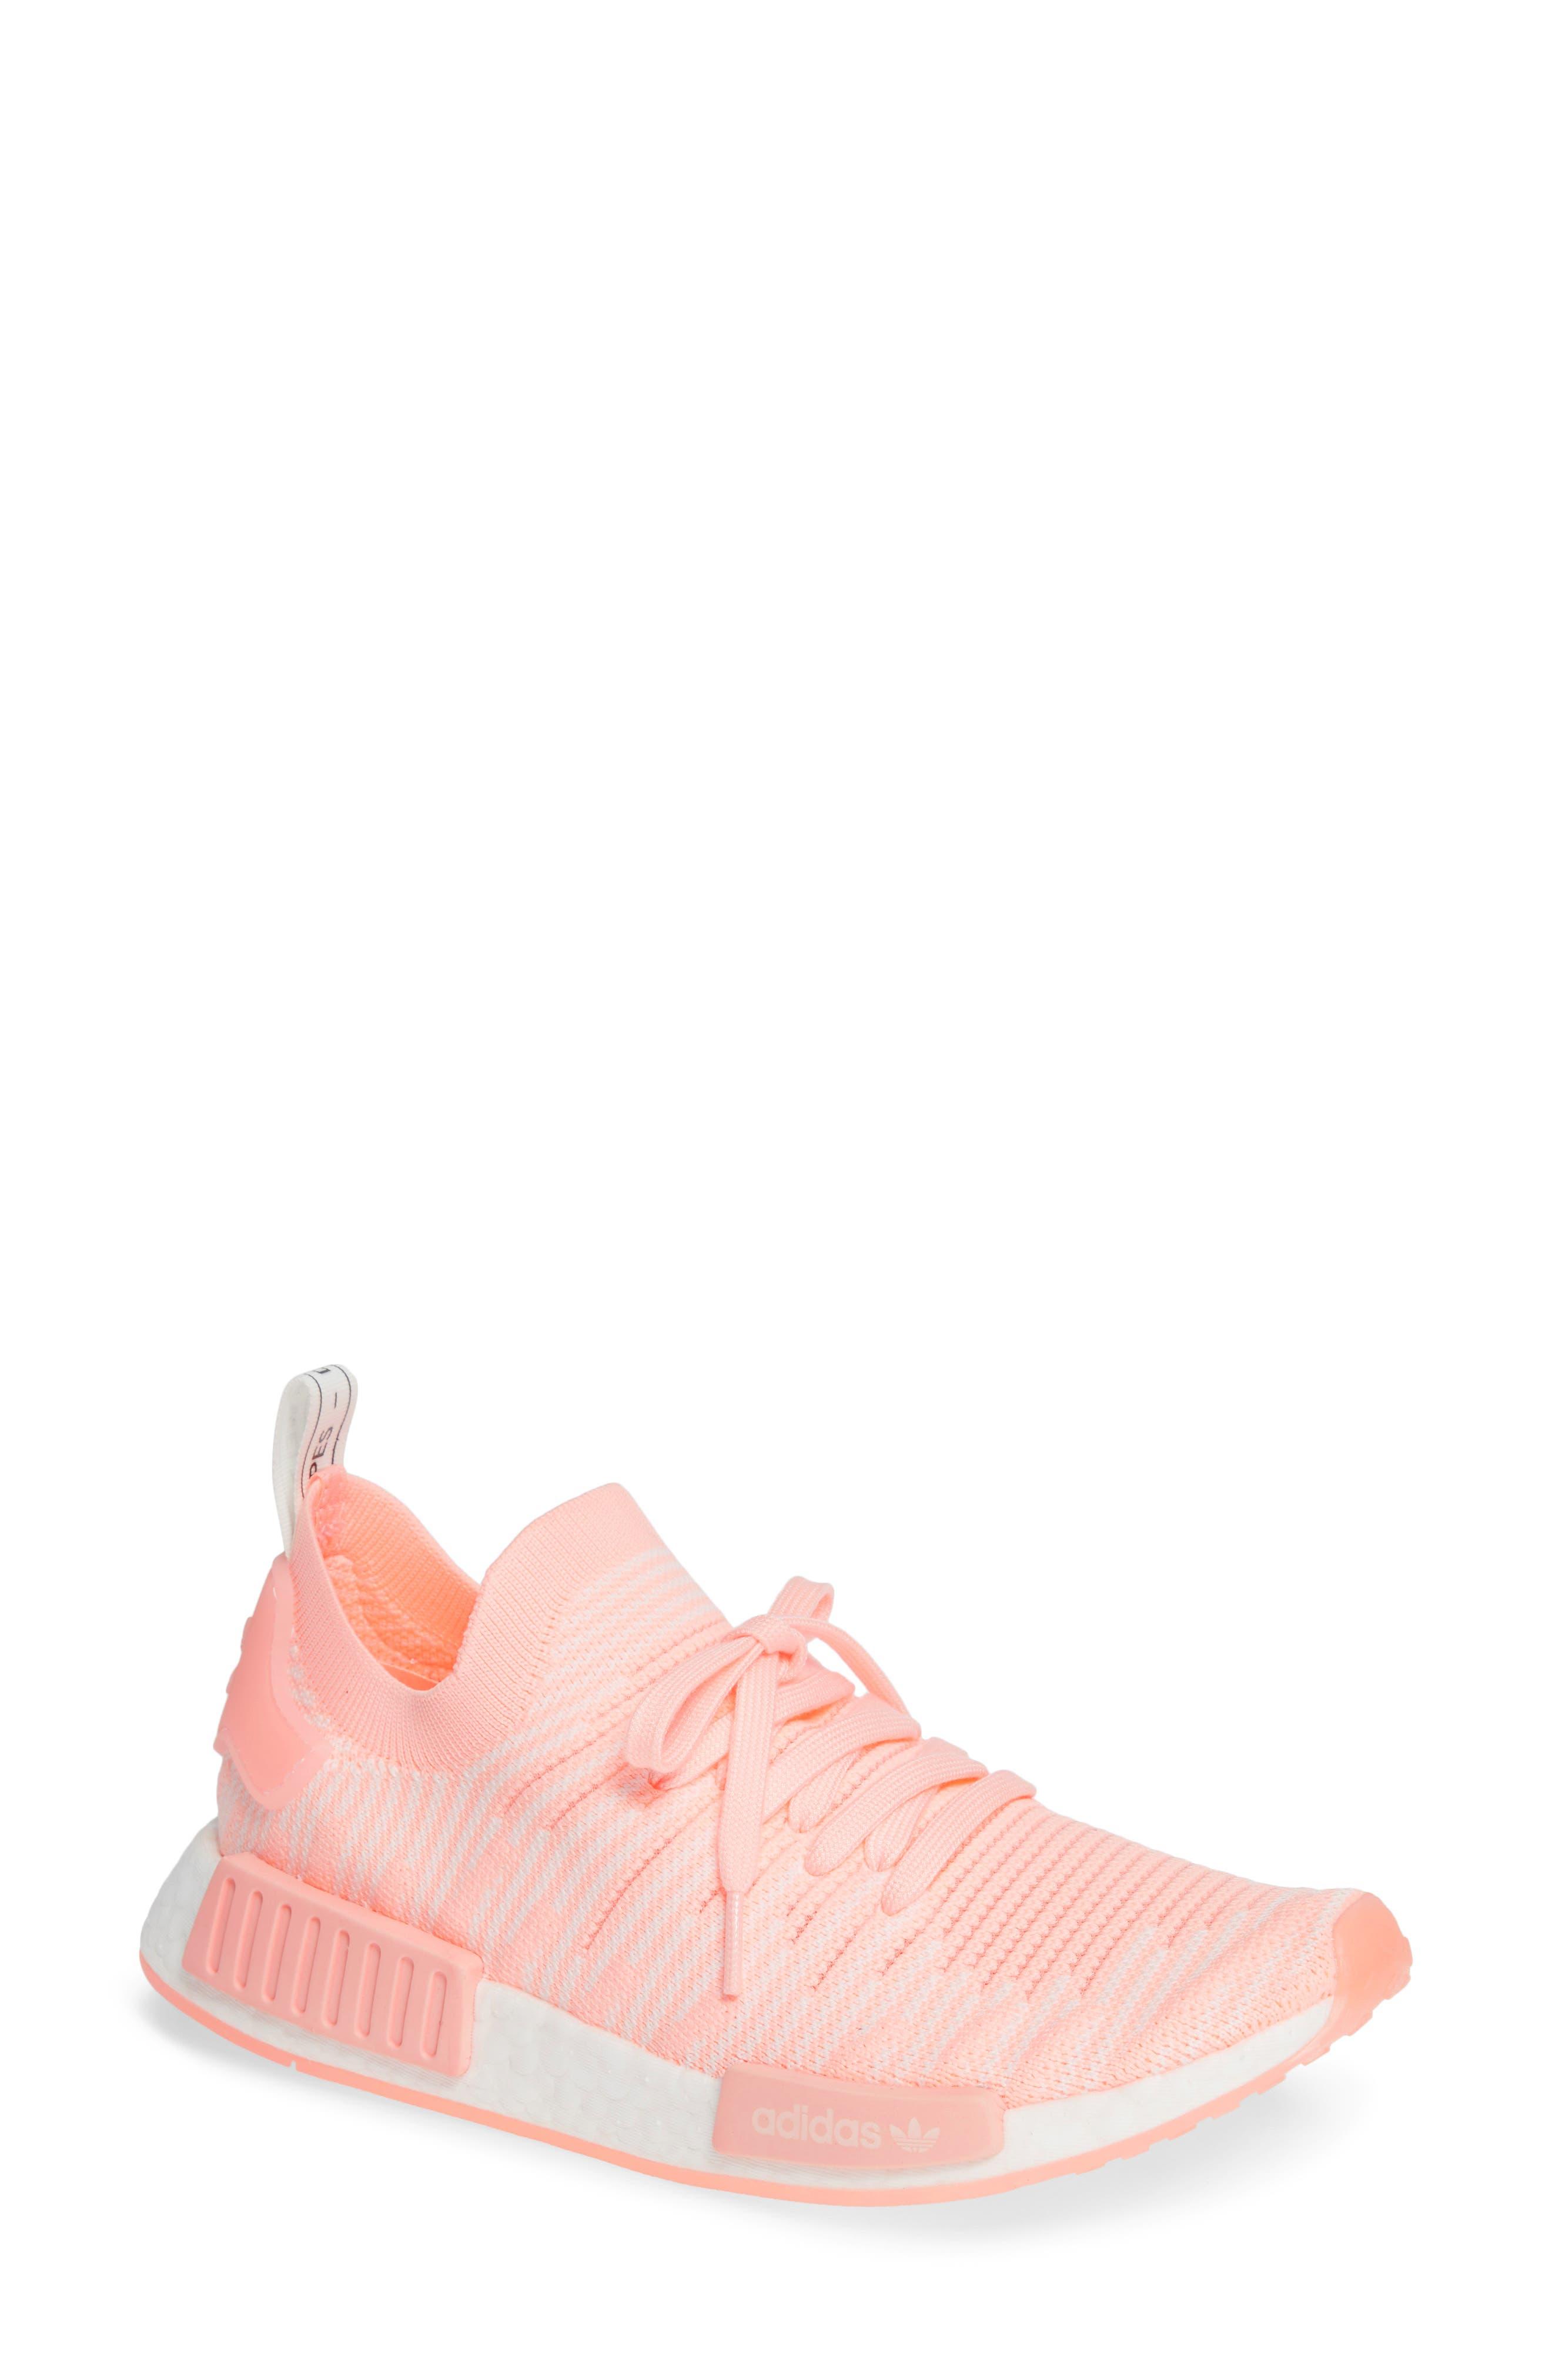 Adidas Originals Nmd R1 Stlt Primeknit Sneaker Clear Orange Cloud